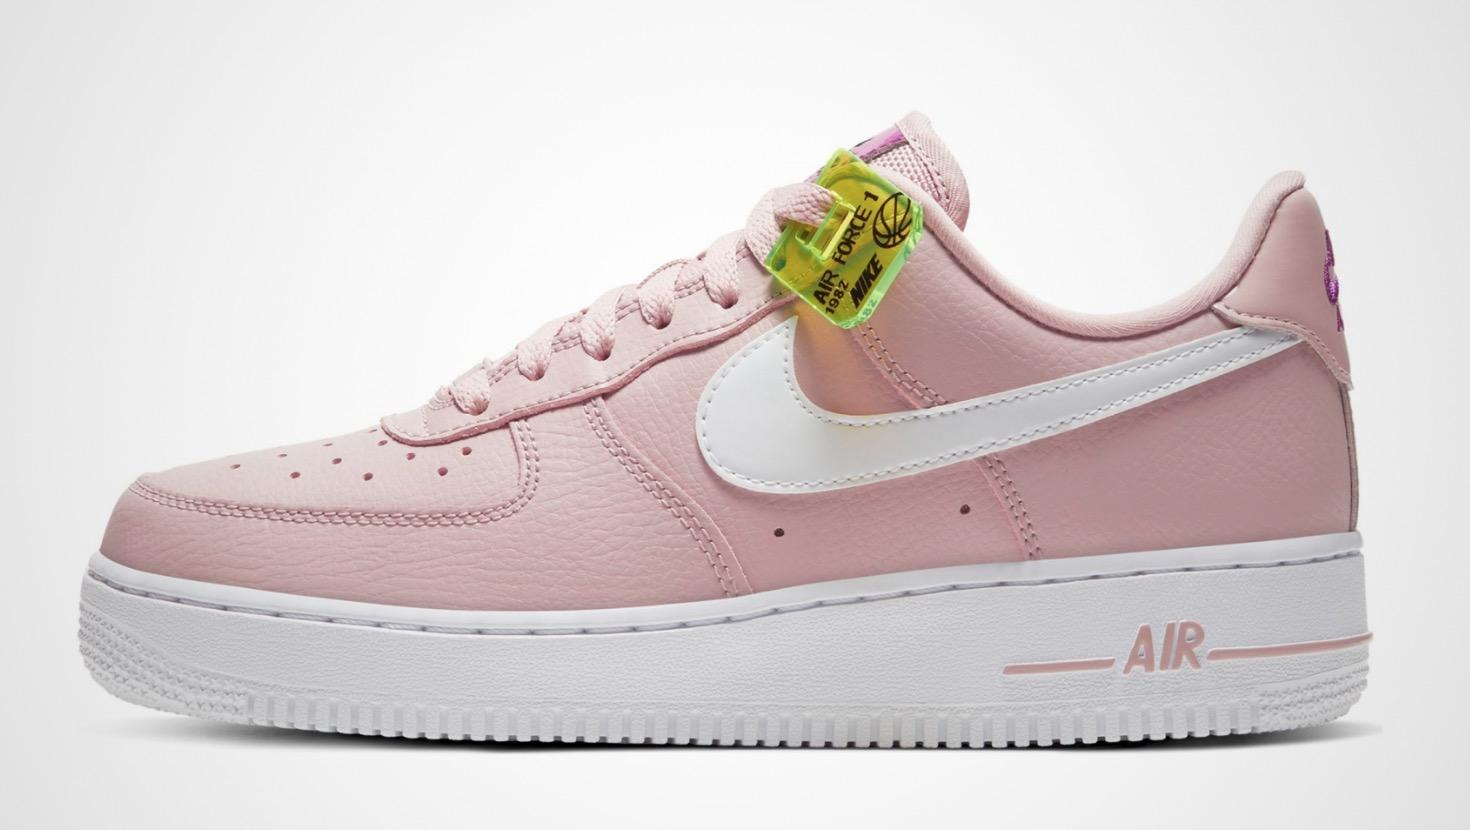 Nike Air Force 1 Pink White